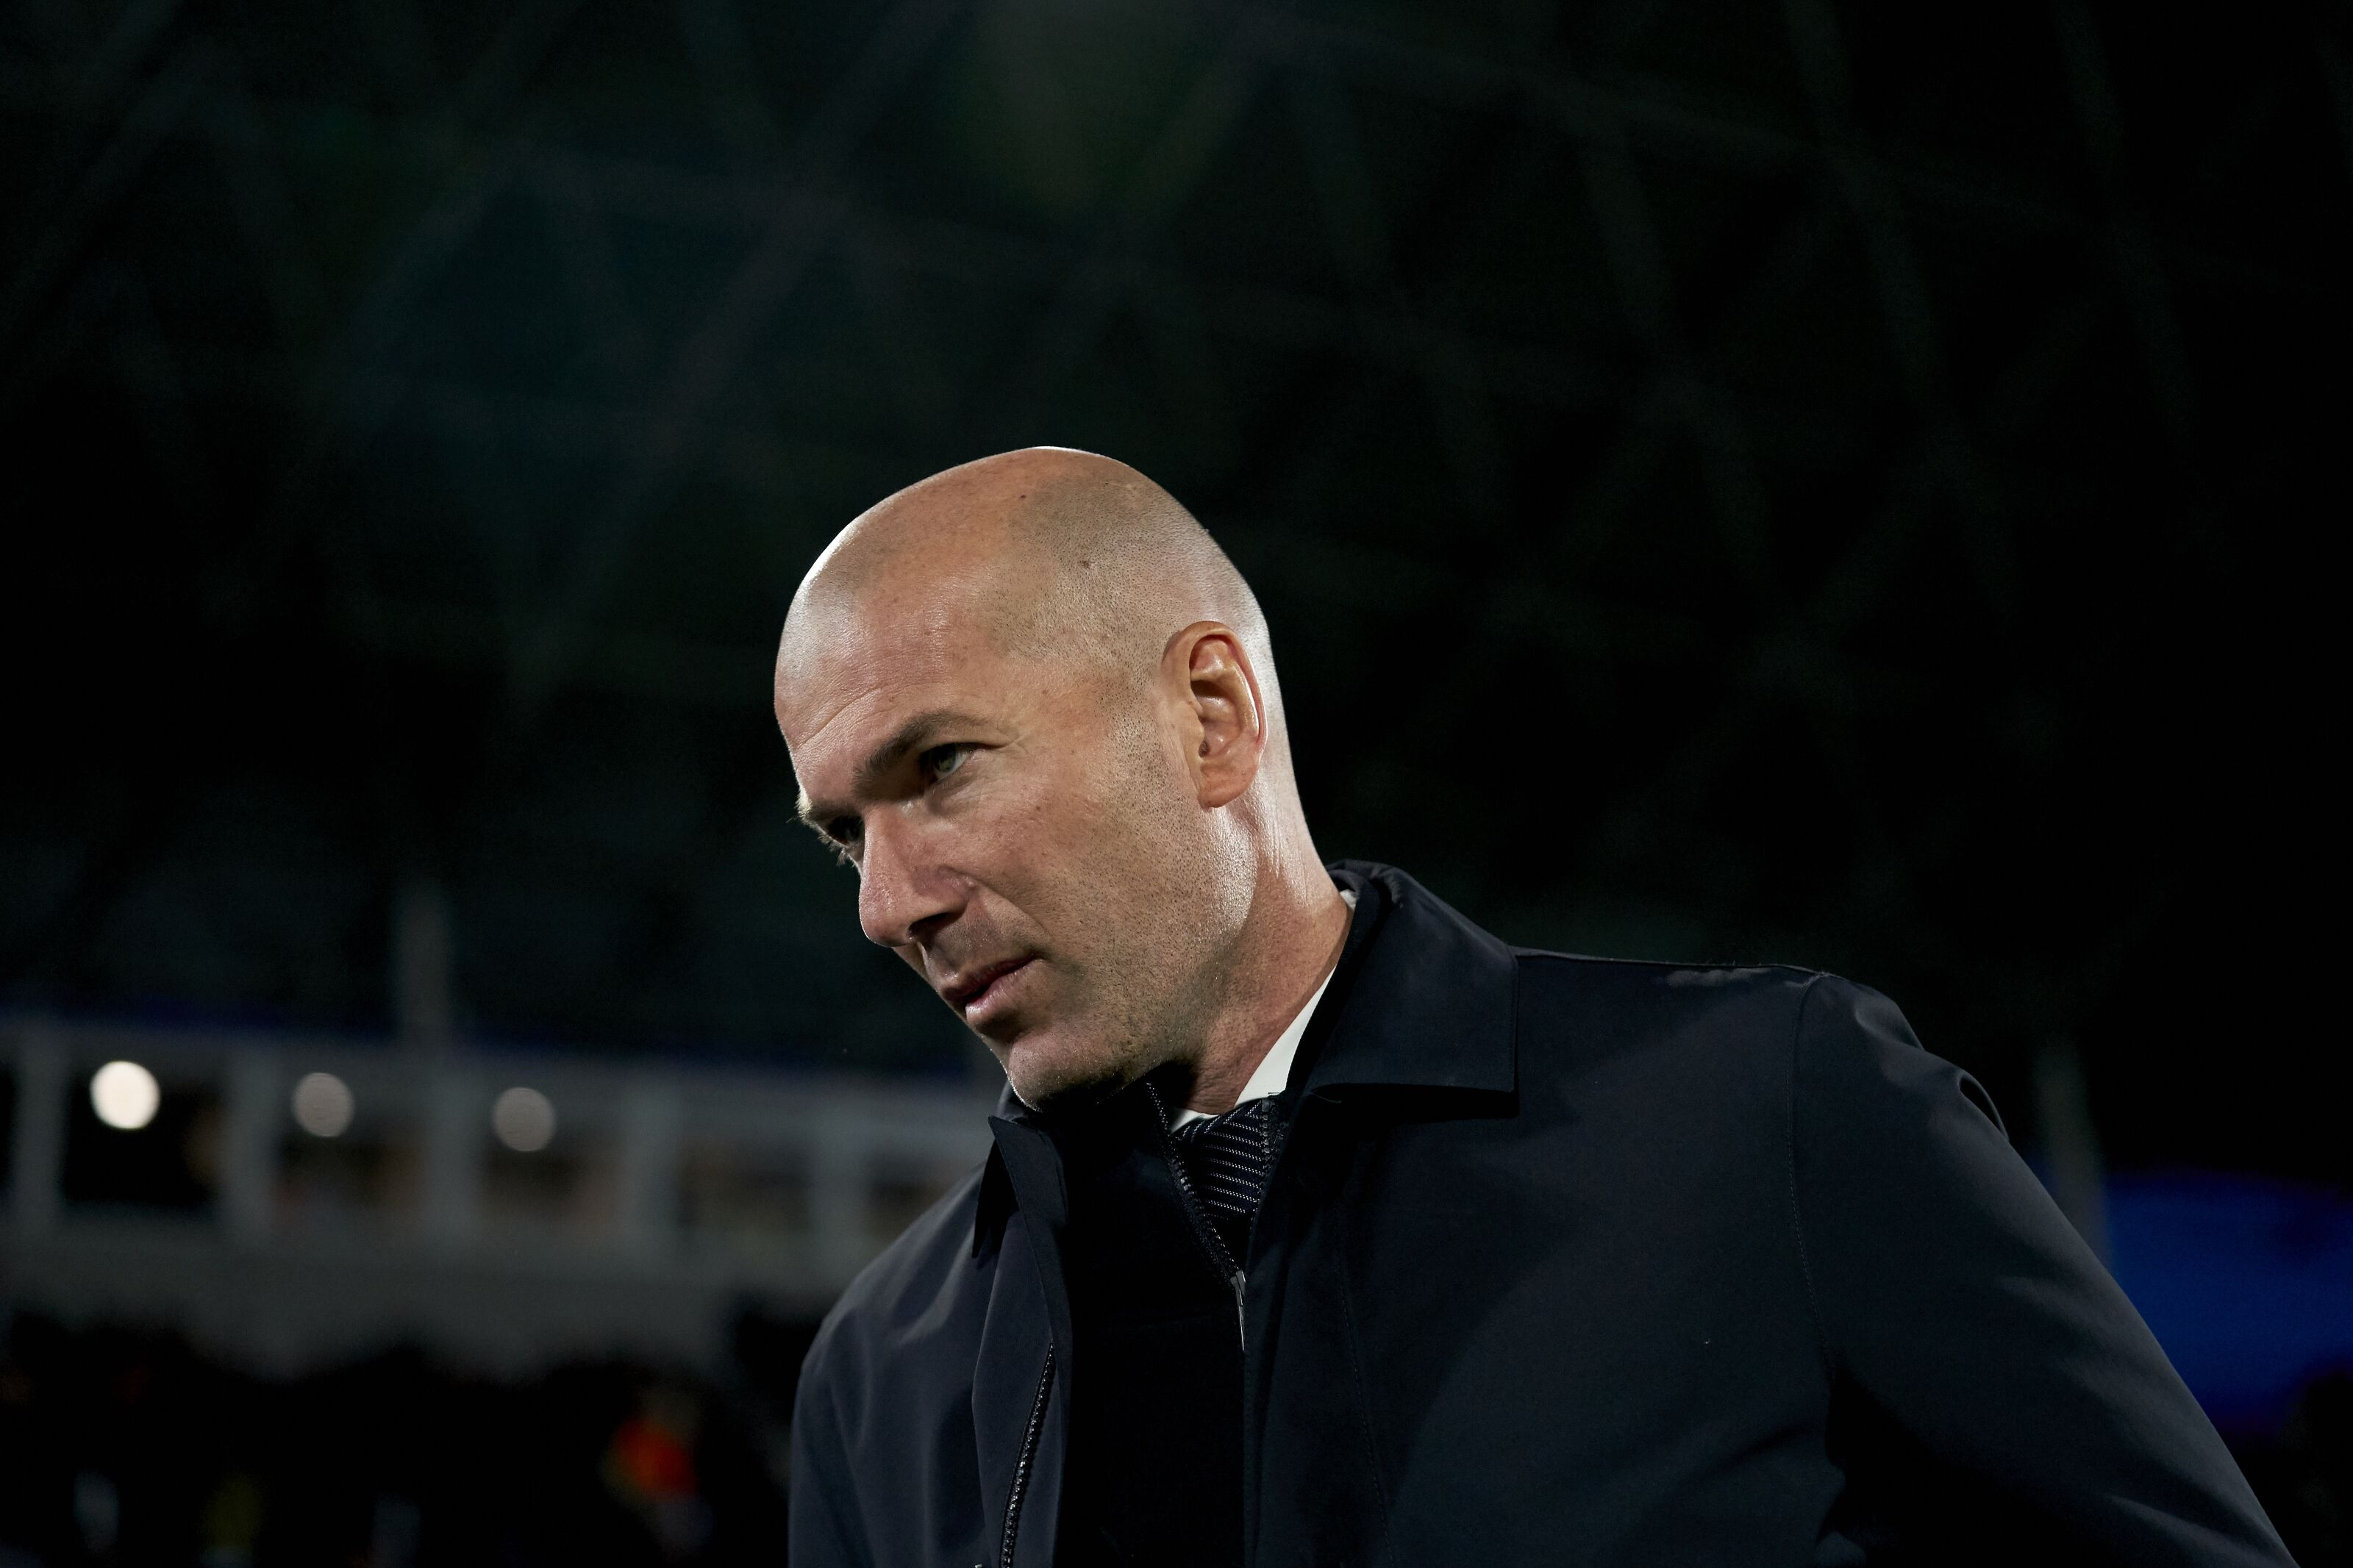 Zinedine Zidane wants to swap 3 Real Madrid players for prime Barcelona target